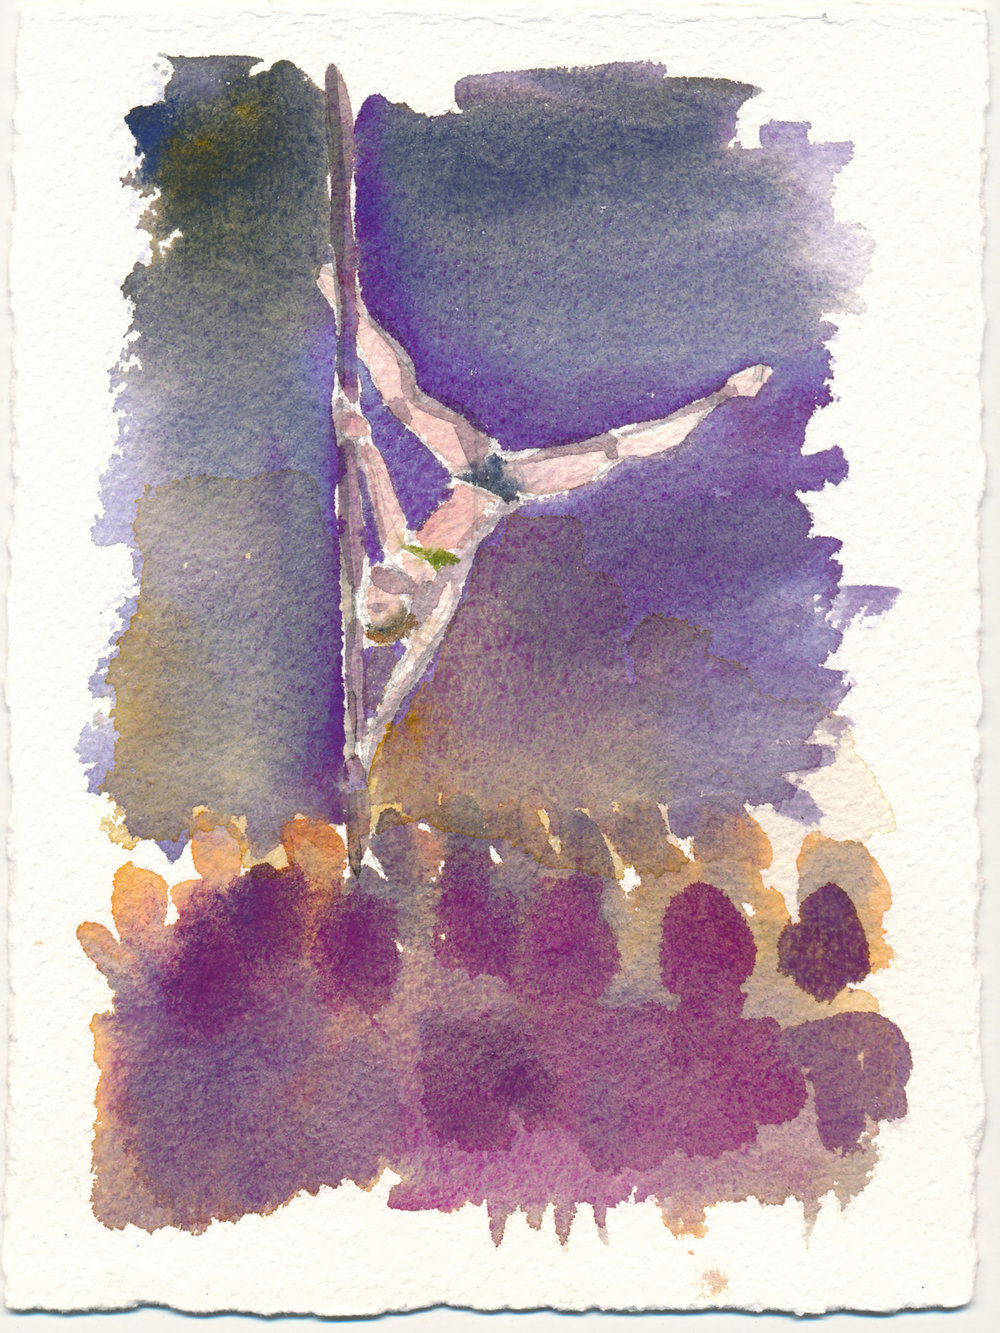 NWUF live painting_0005.jpg